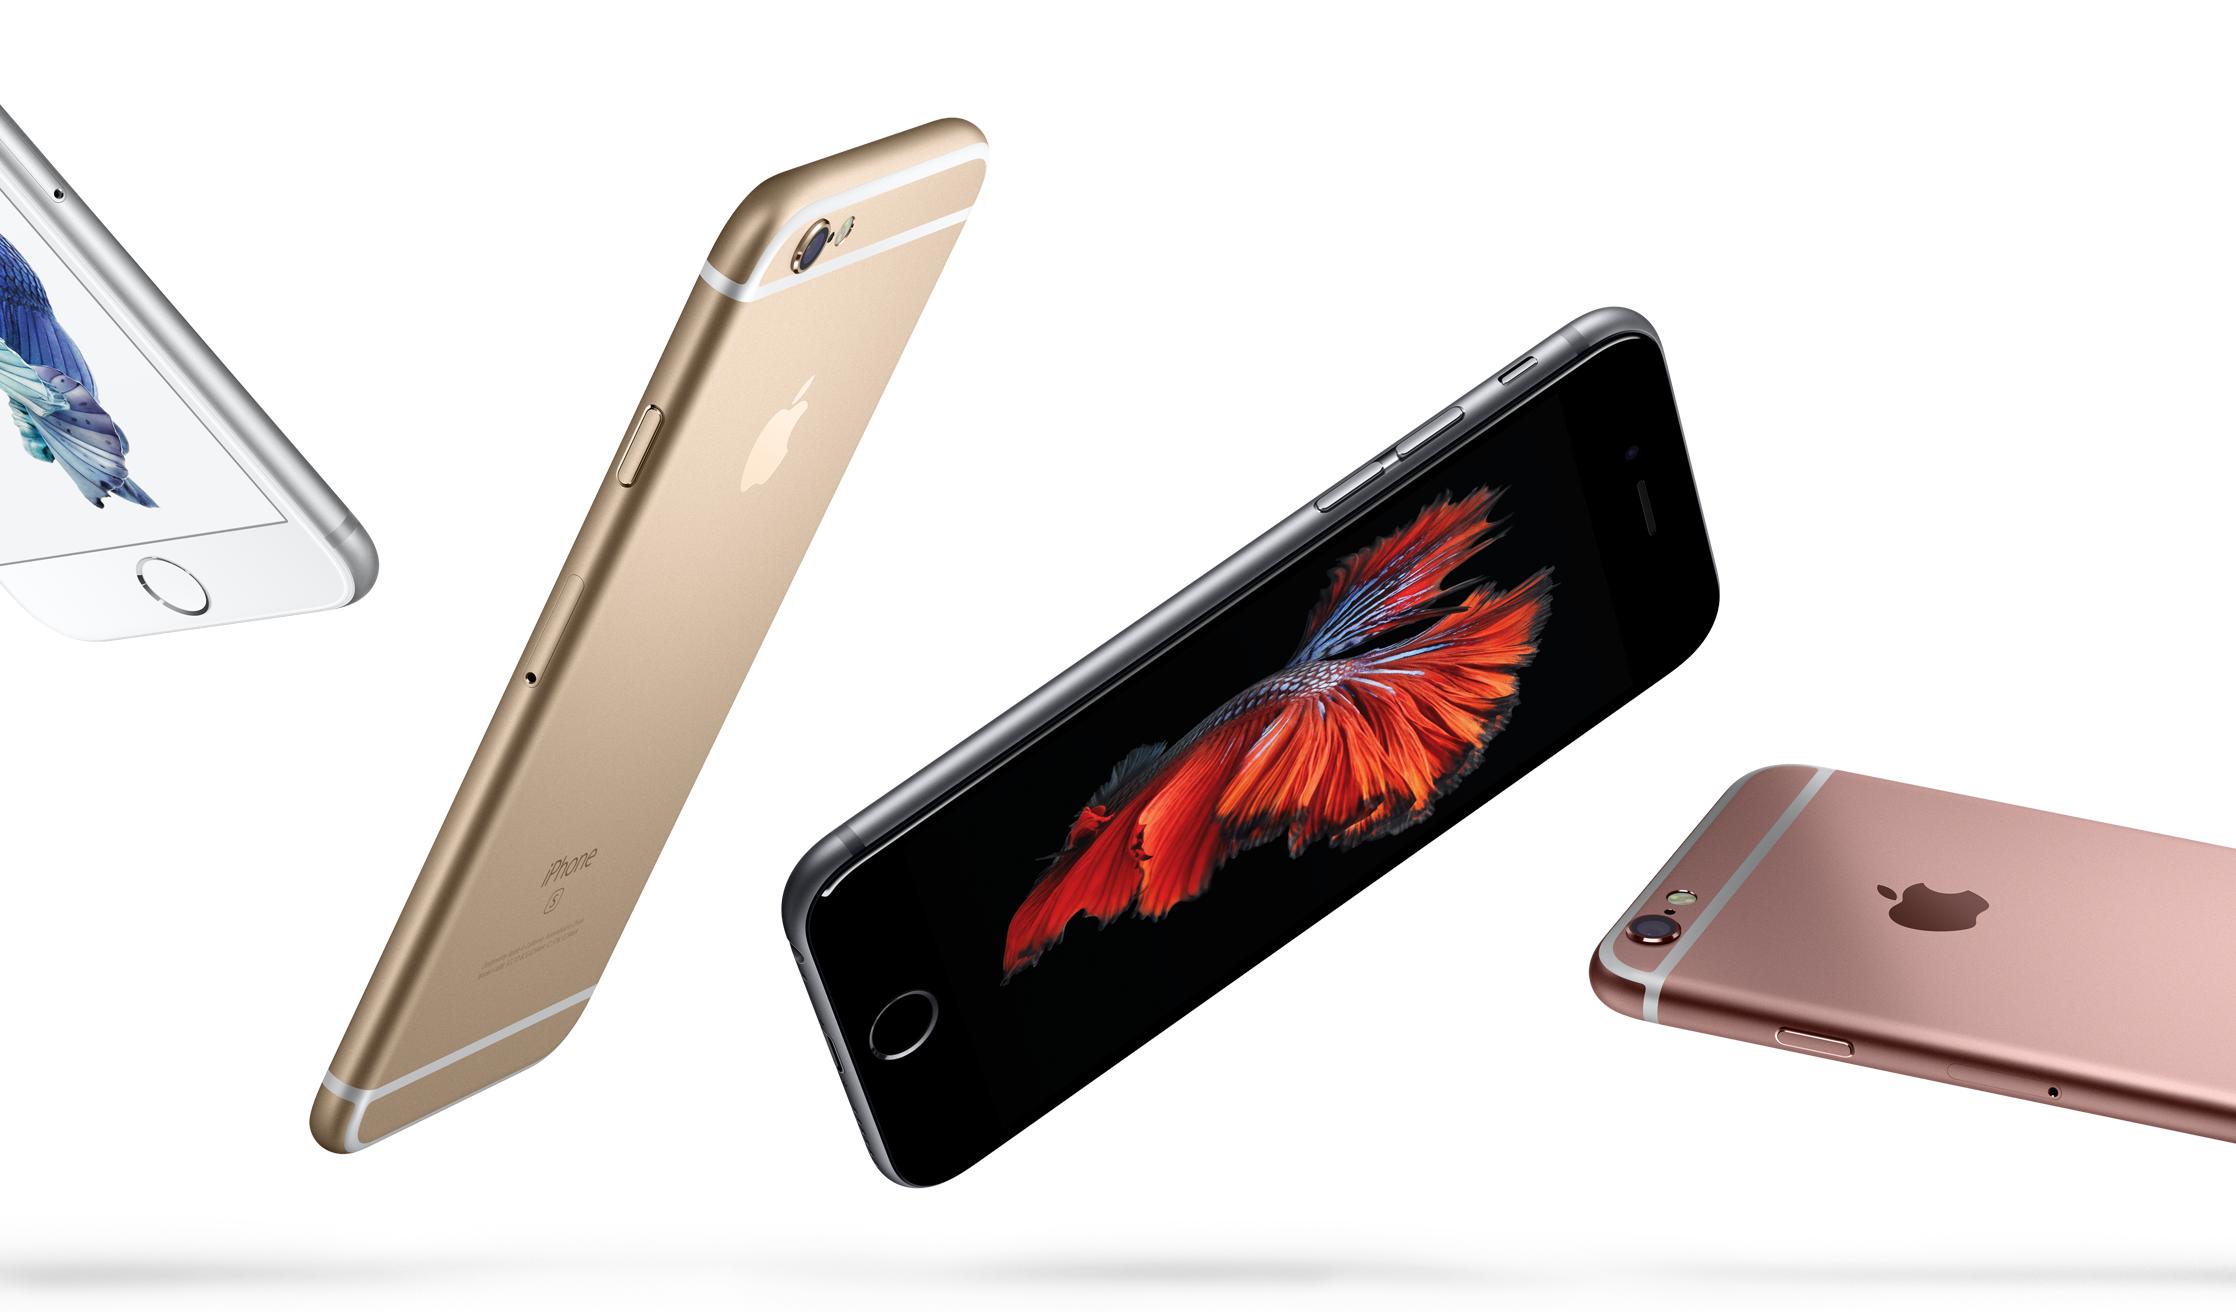 iPhone 6s и 6s Plus весят больше в основном за счет технологии 3D Touch